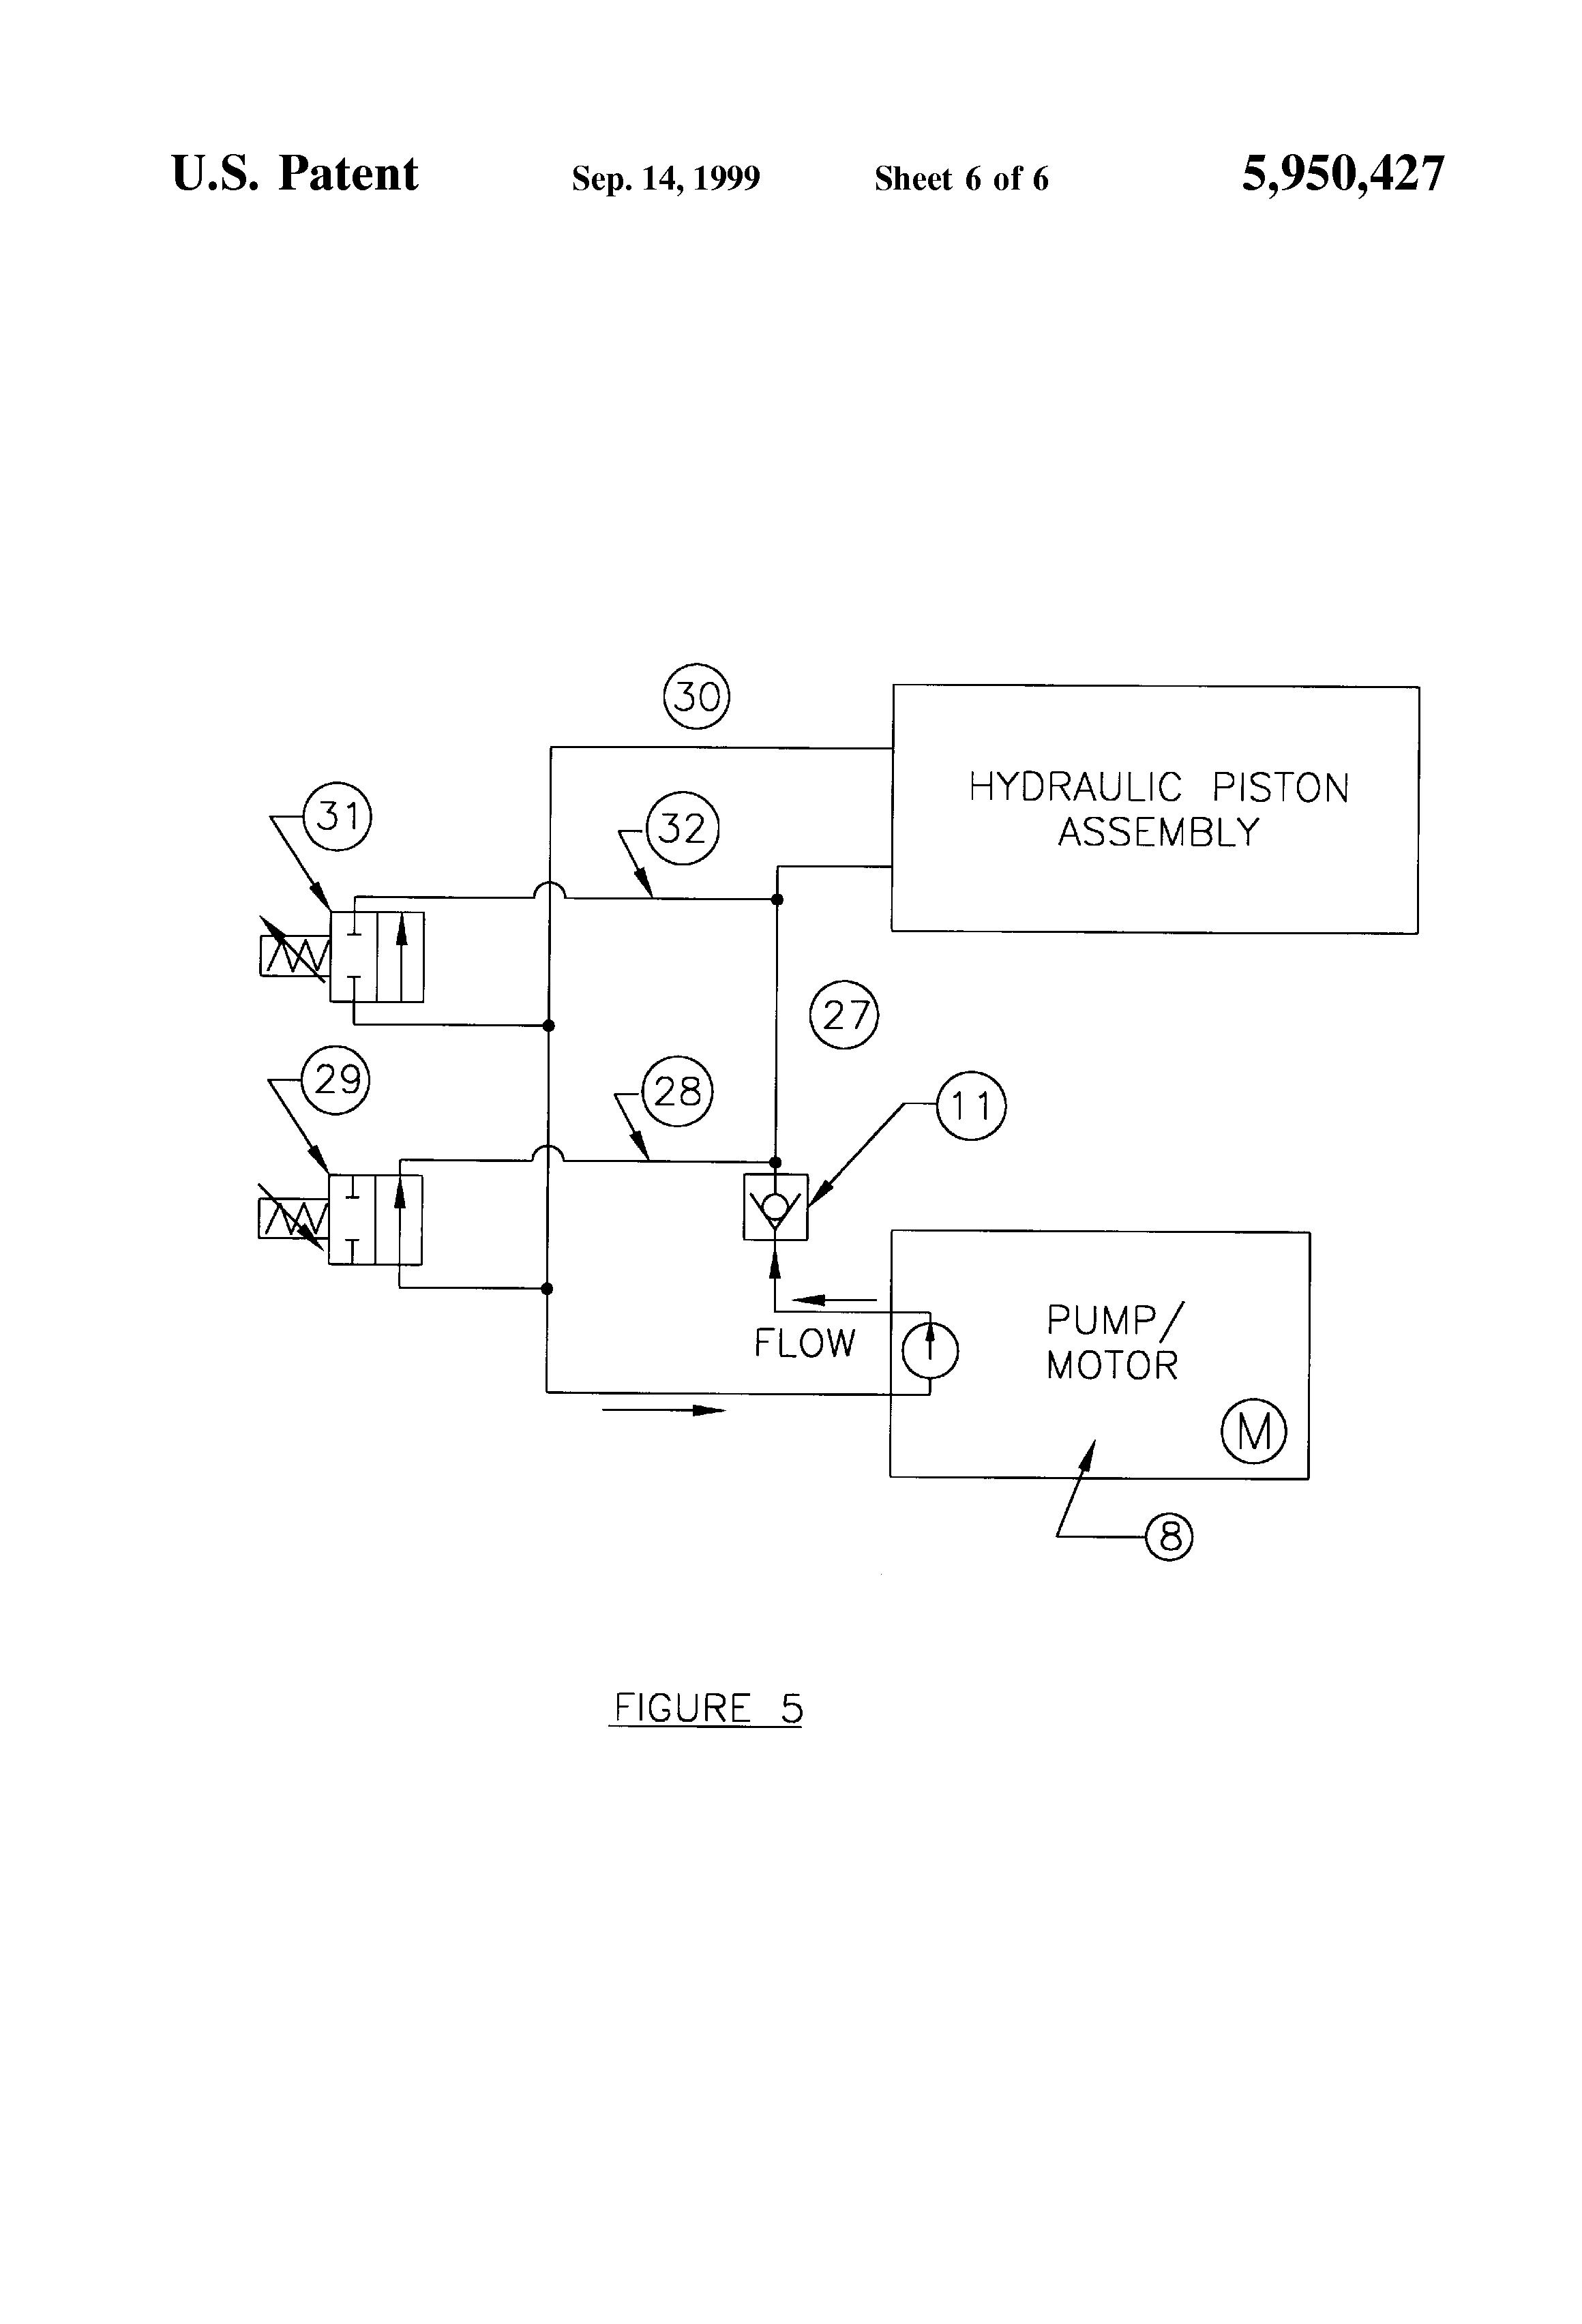 Bettis Em 500 Wiring Diagram